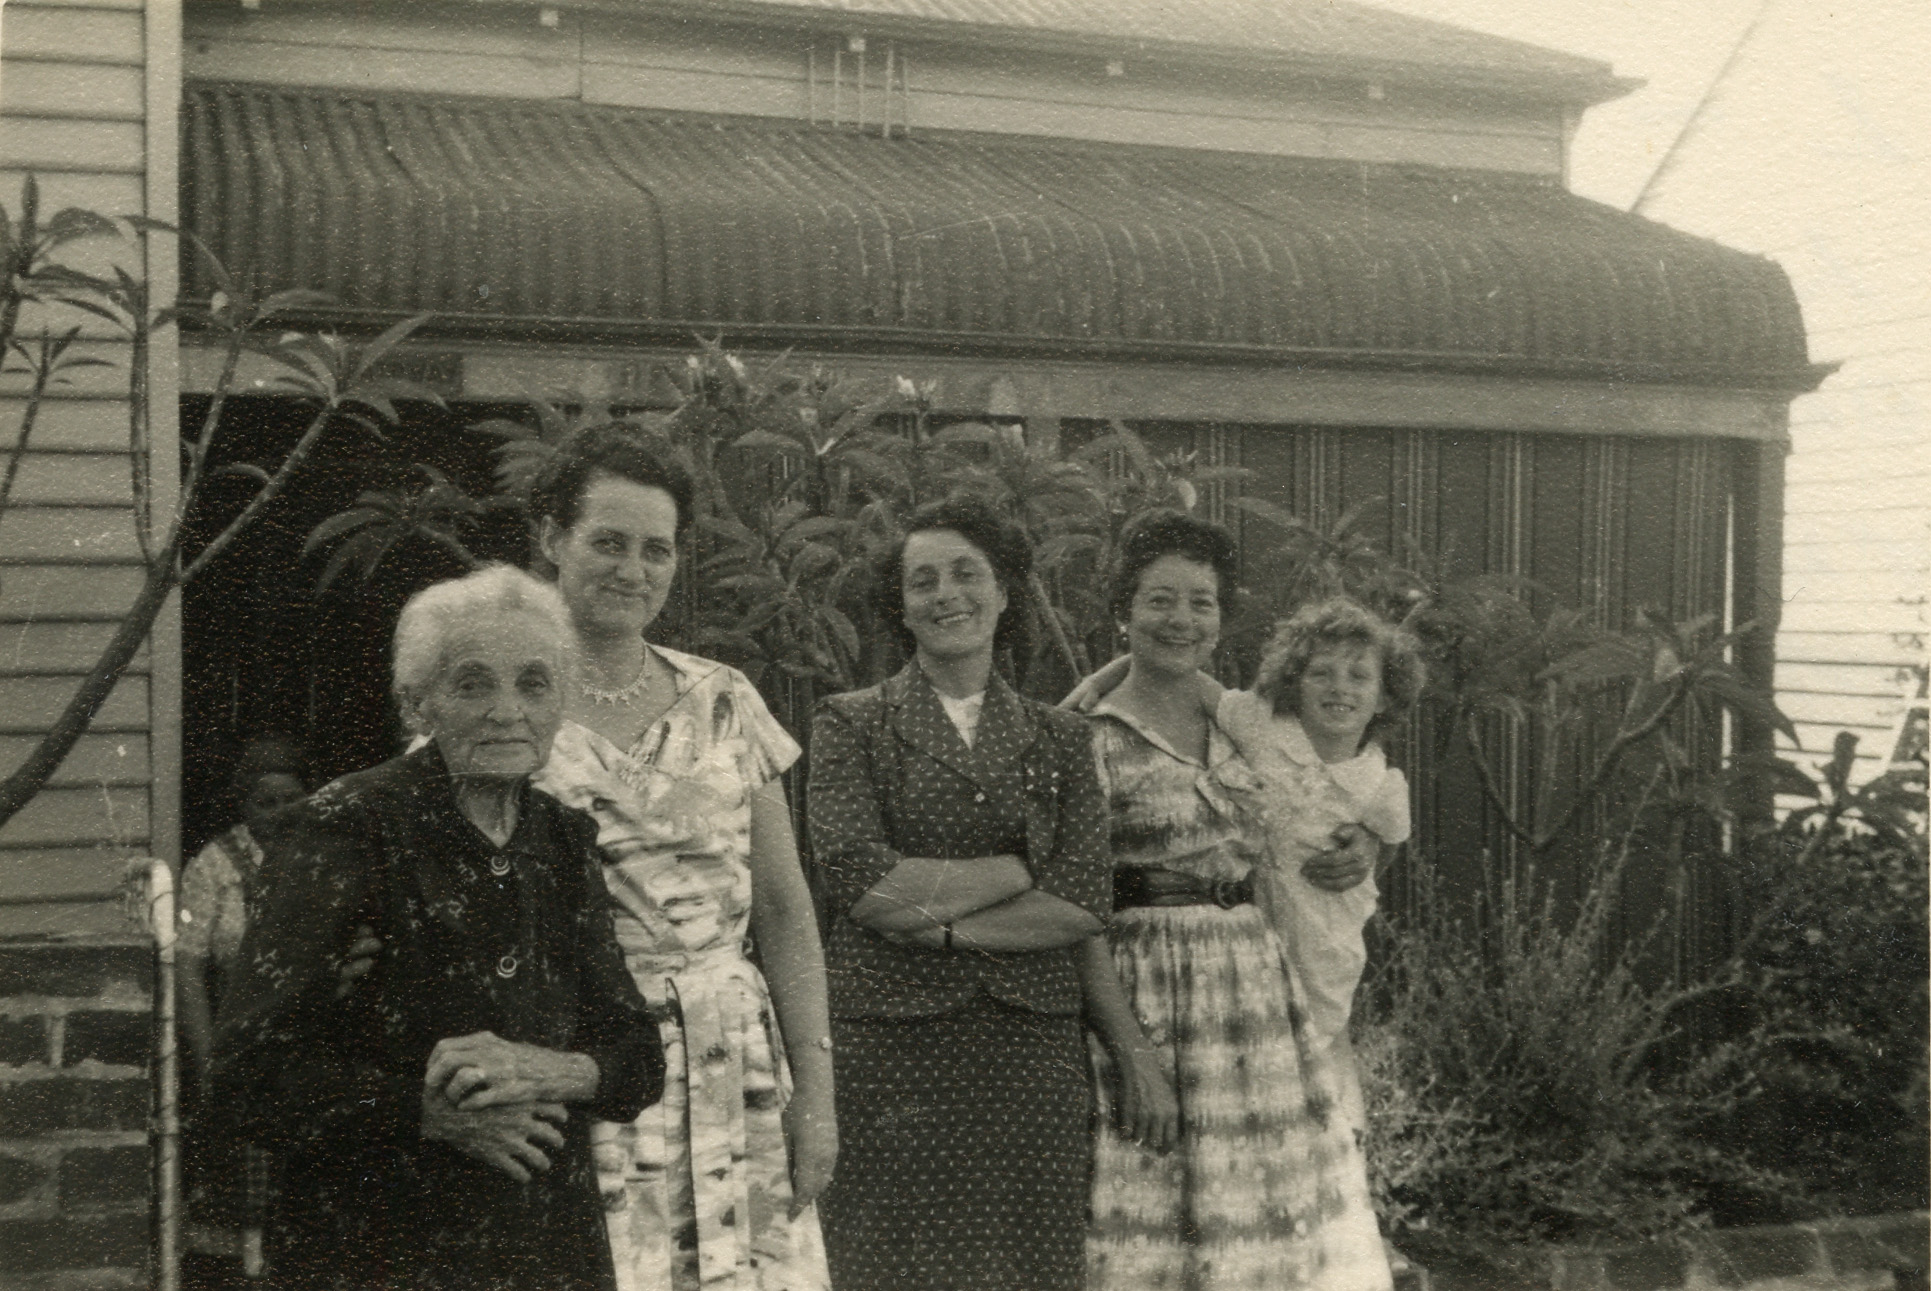 25. Xmas Day Peach St, 1954